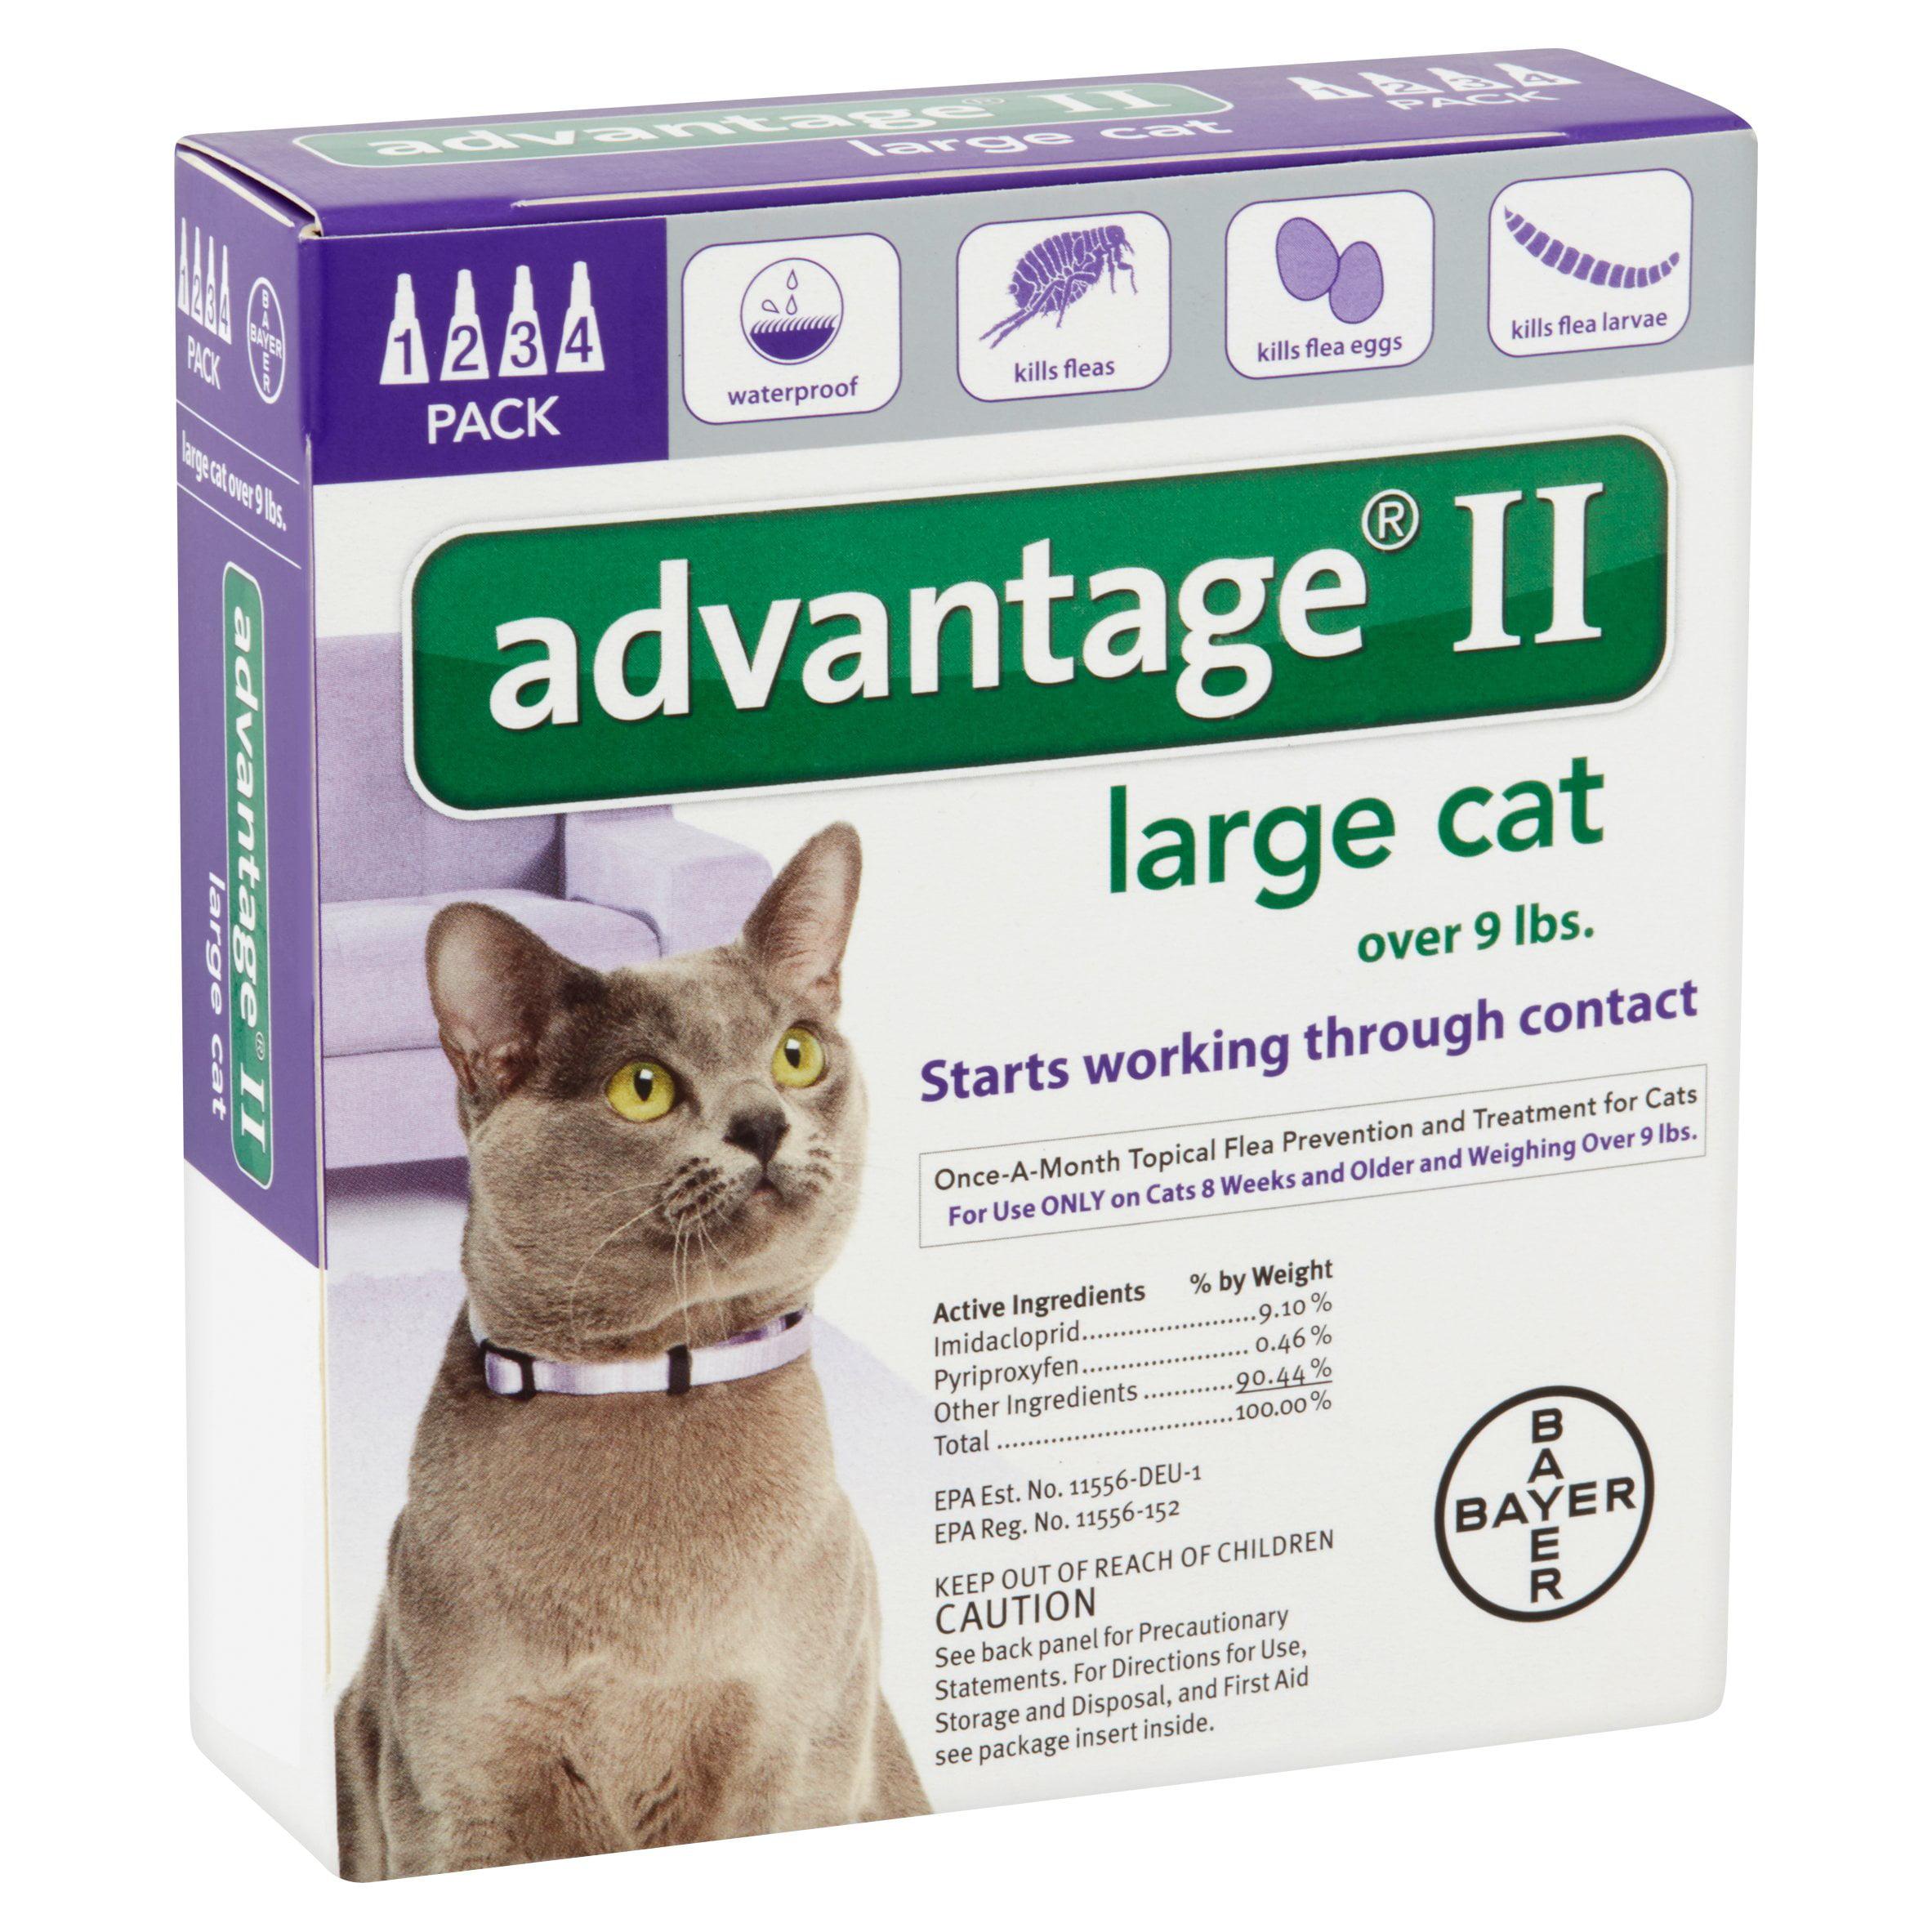 Advantage II Flea & Tick Treatment for Large Cats, 4 Doses by Advantage